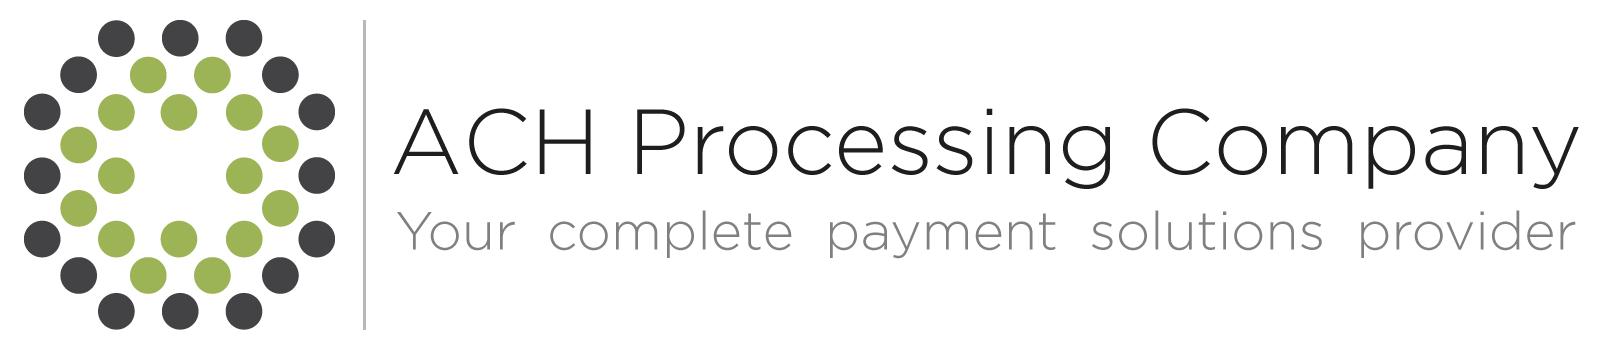 ACH Processing Company